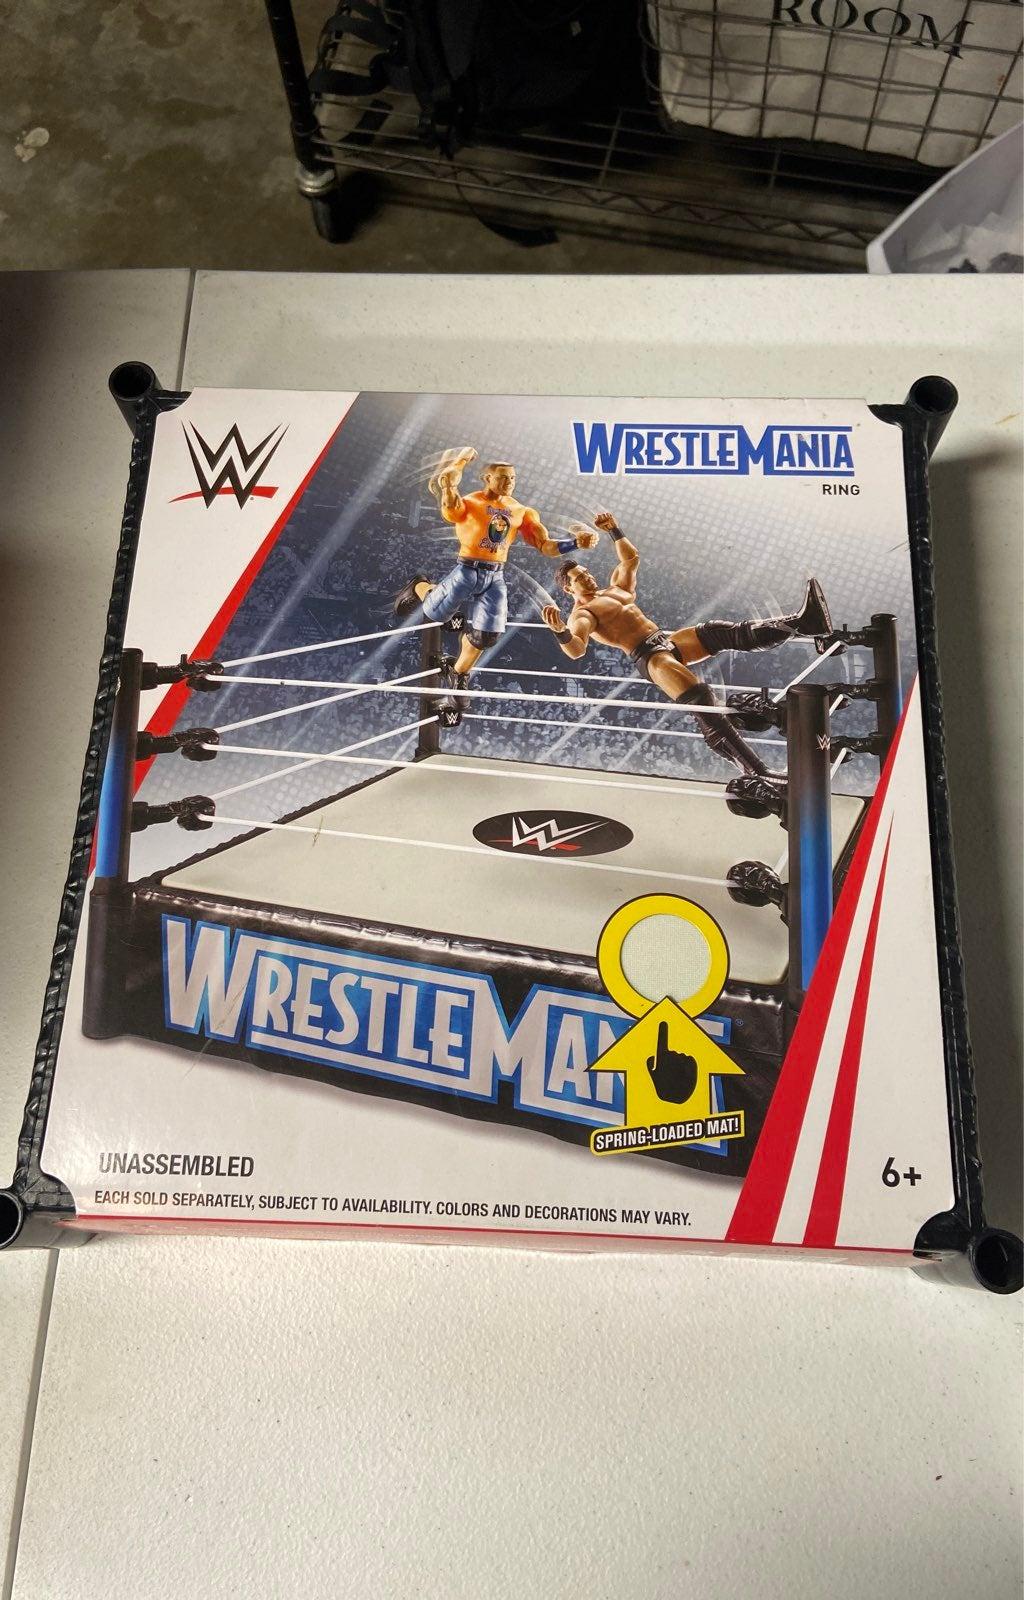 New WWE WrestleMania wrestling ring